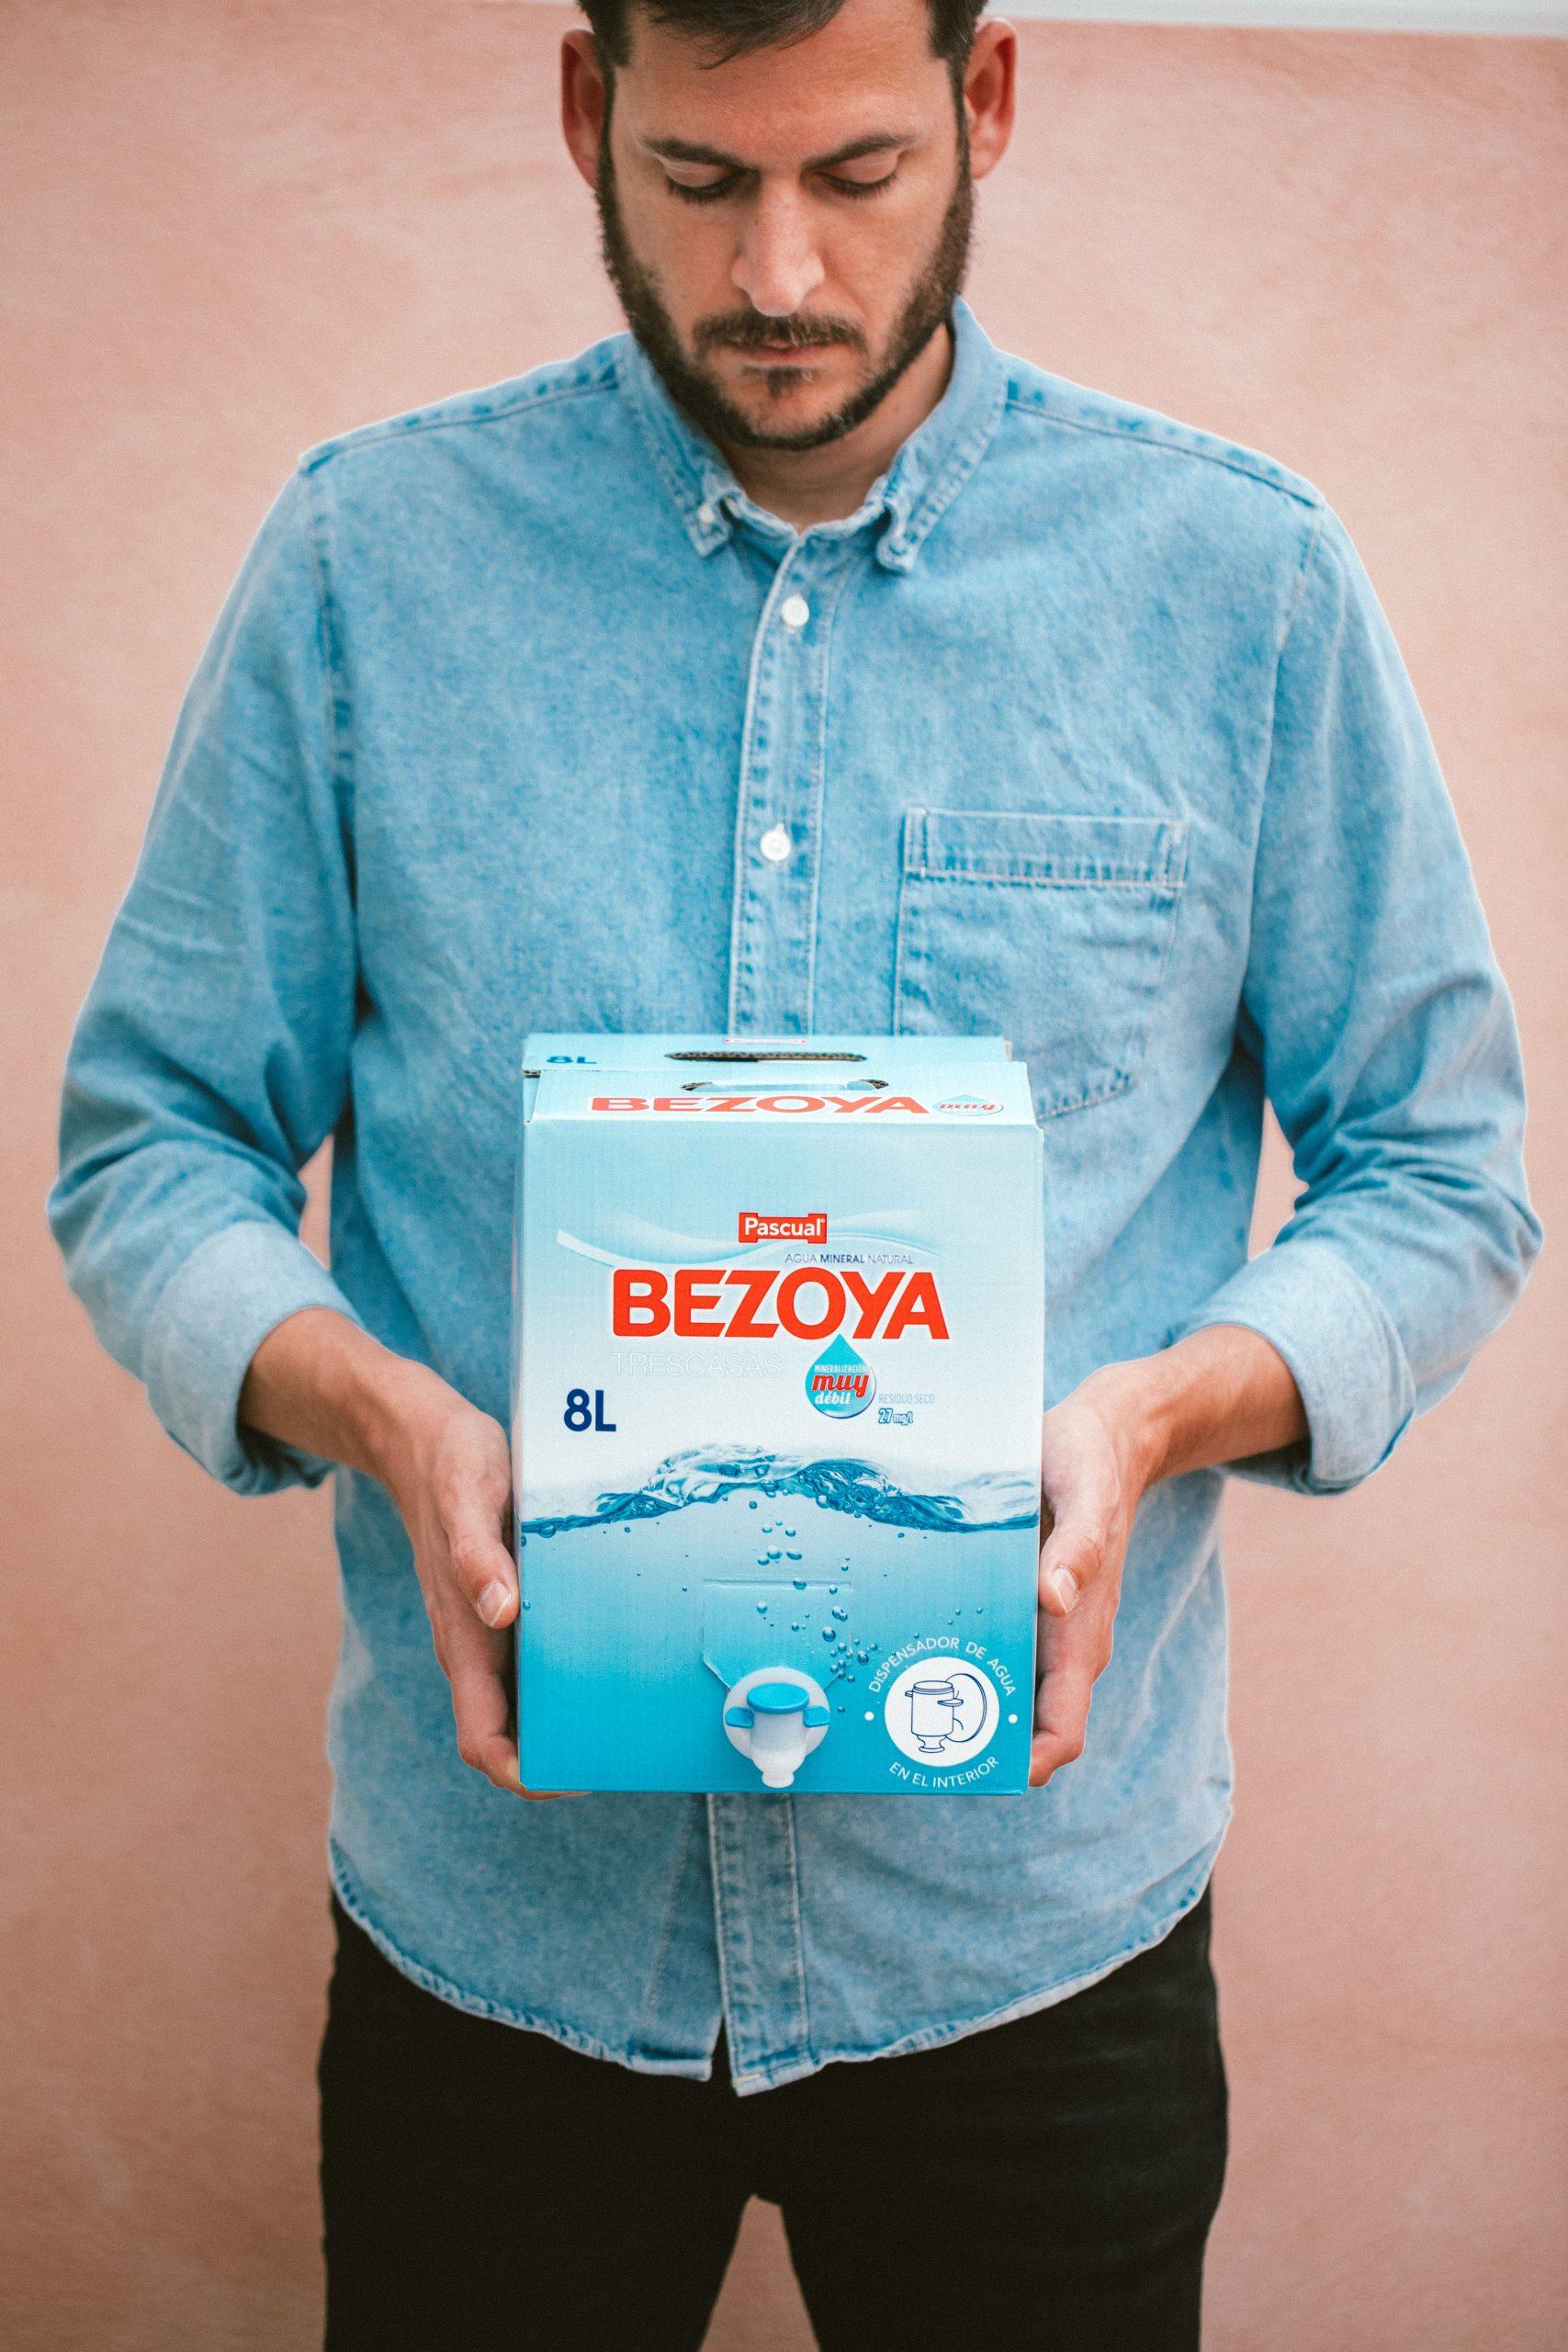 8 litros Bezoya